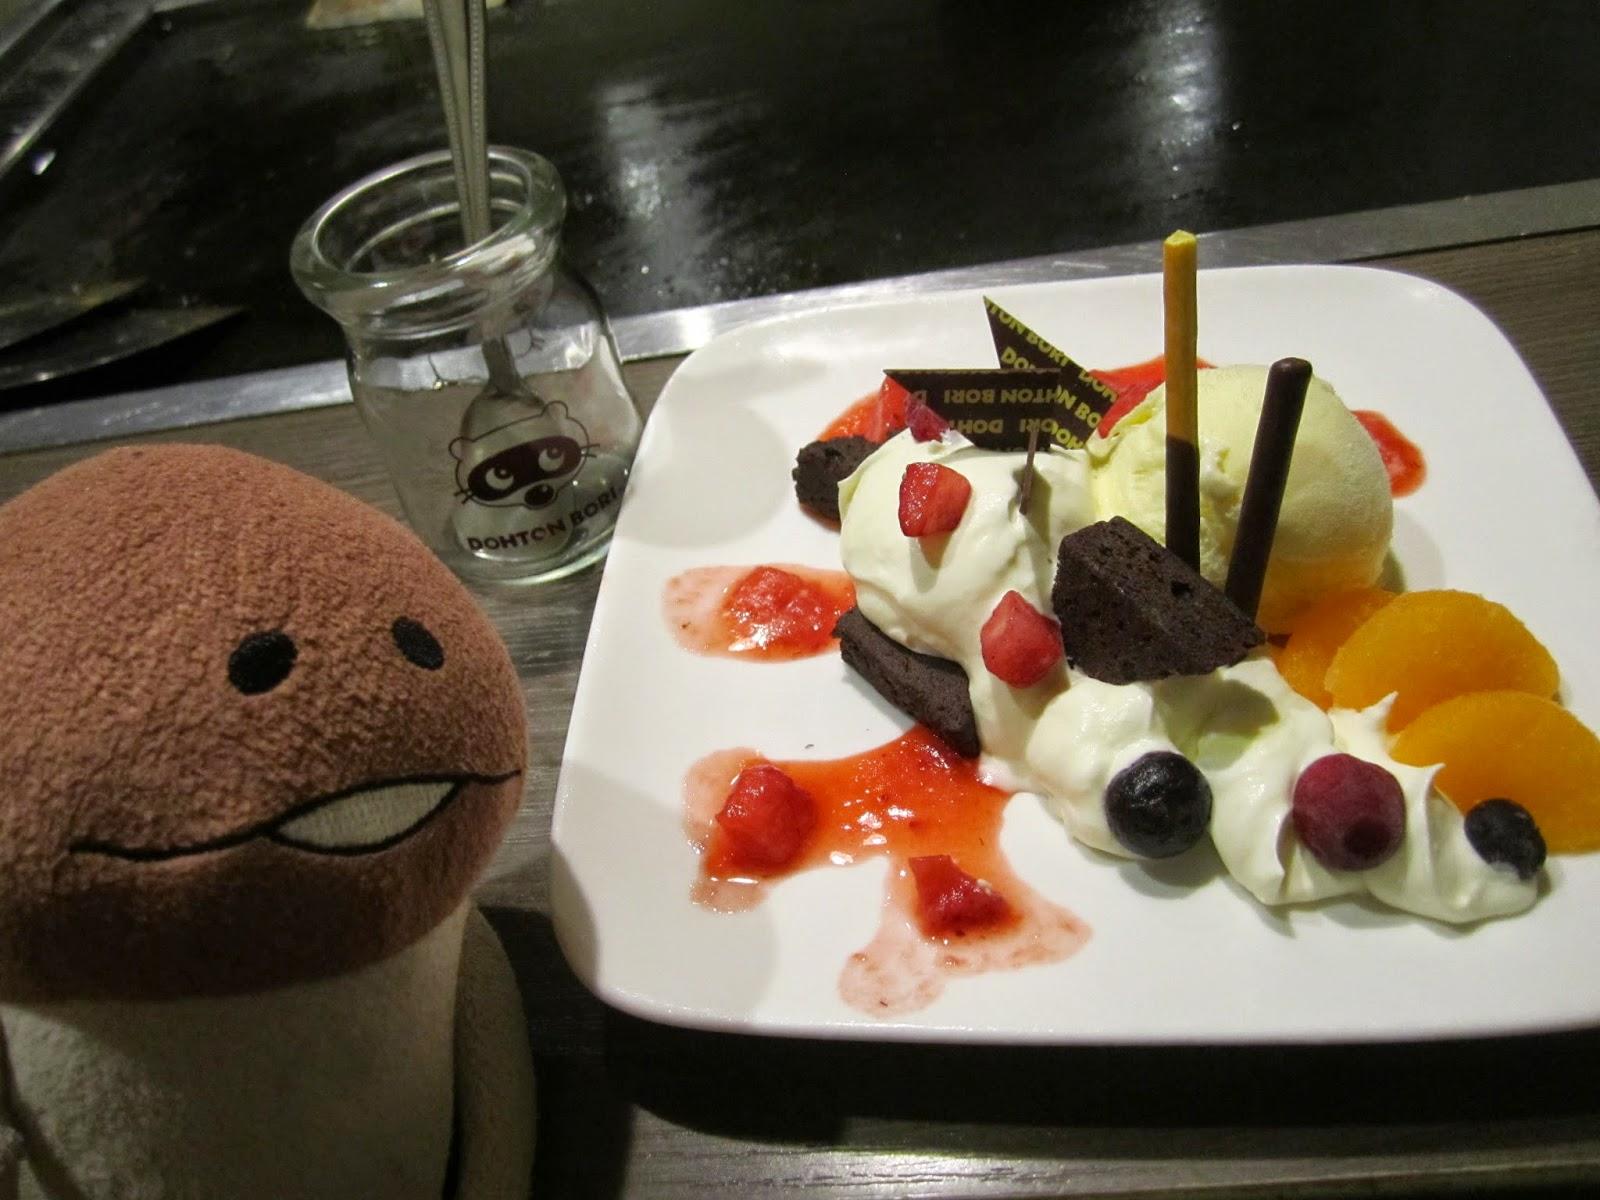 Towada Dohtonbori Birthday Dessert 道頓堀十和田店 誕生日サービスデザート